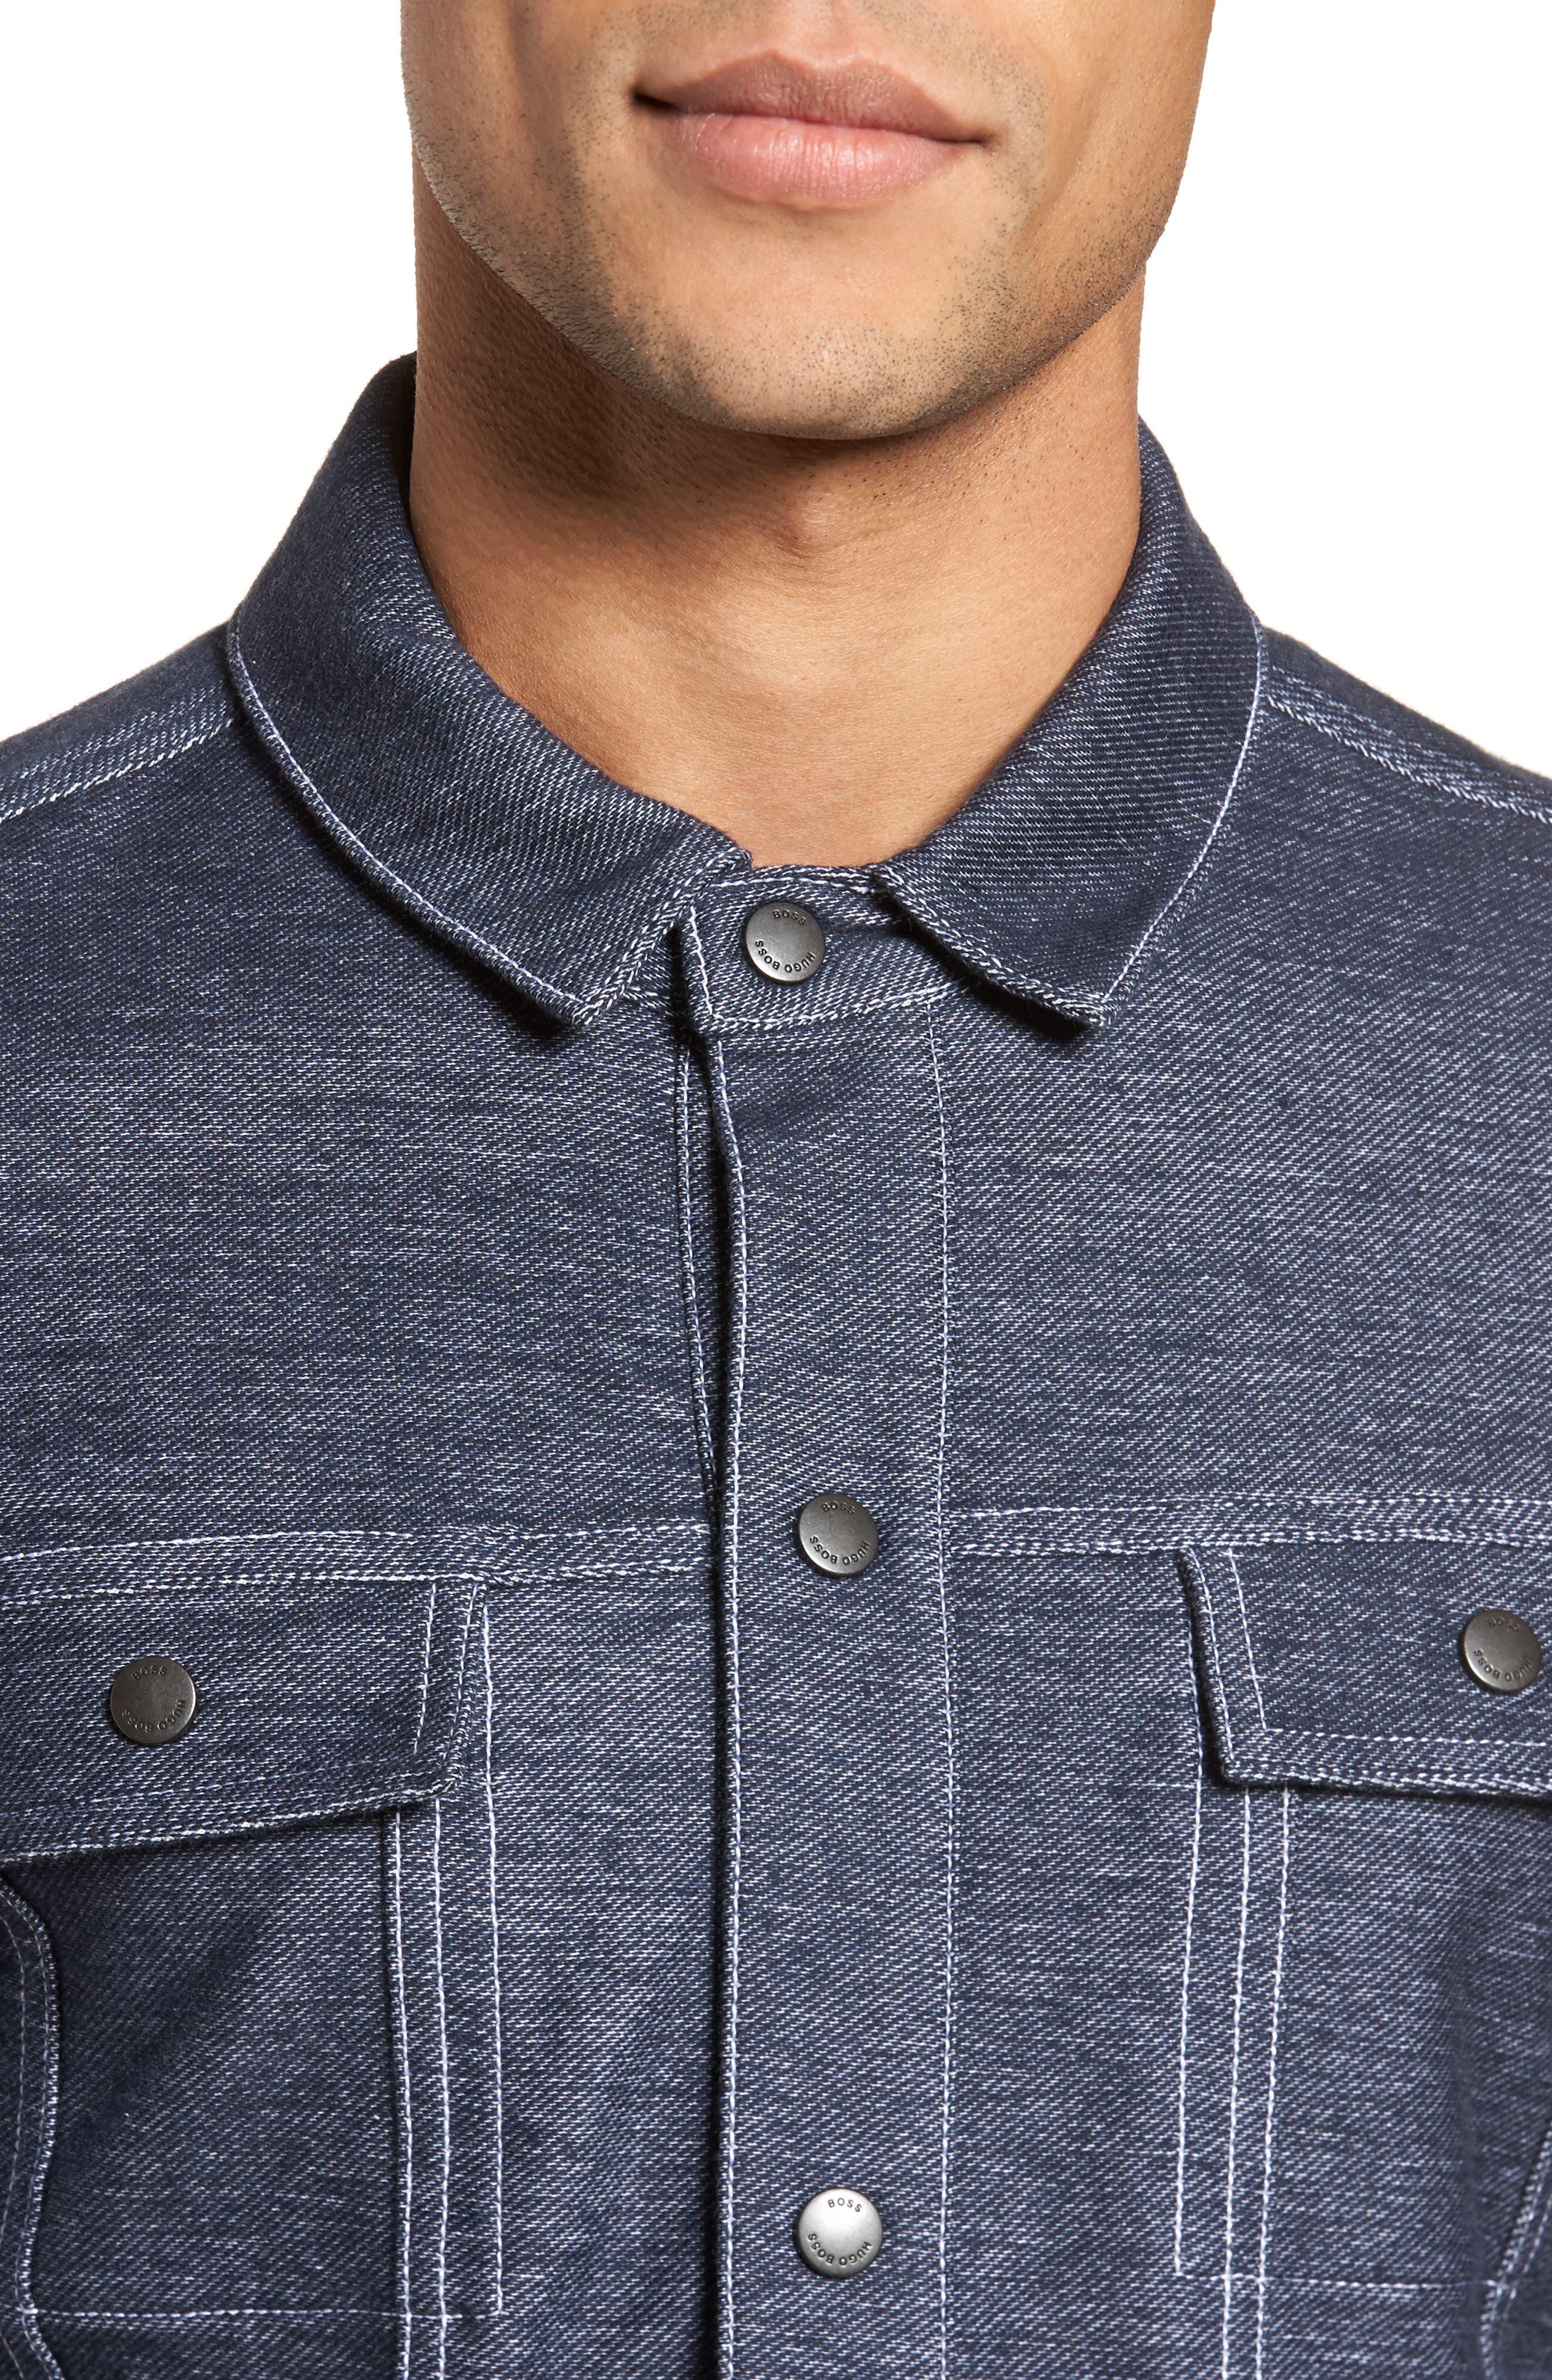 Sigmon Stretch Denim Jacket,                             Alternate thumbnail 4, color,                             Blue